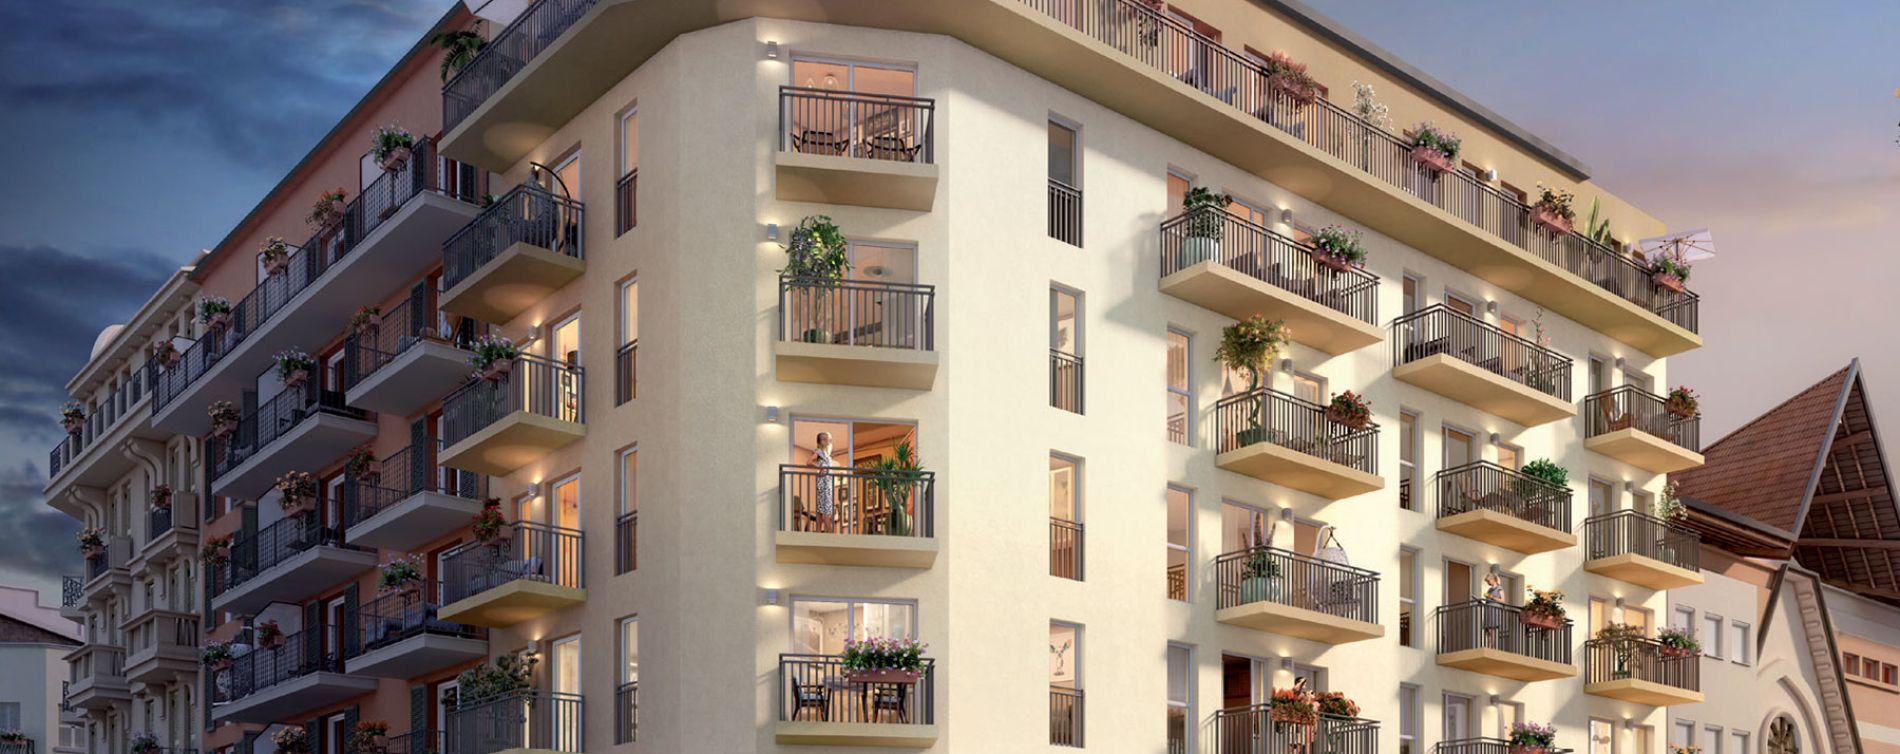 Résidence Esprit City à Nice